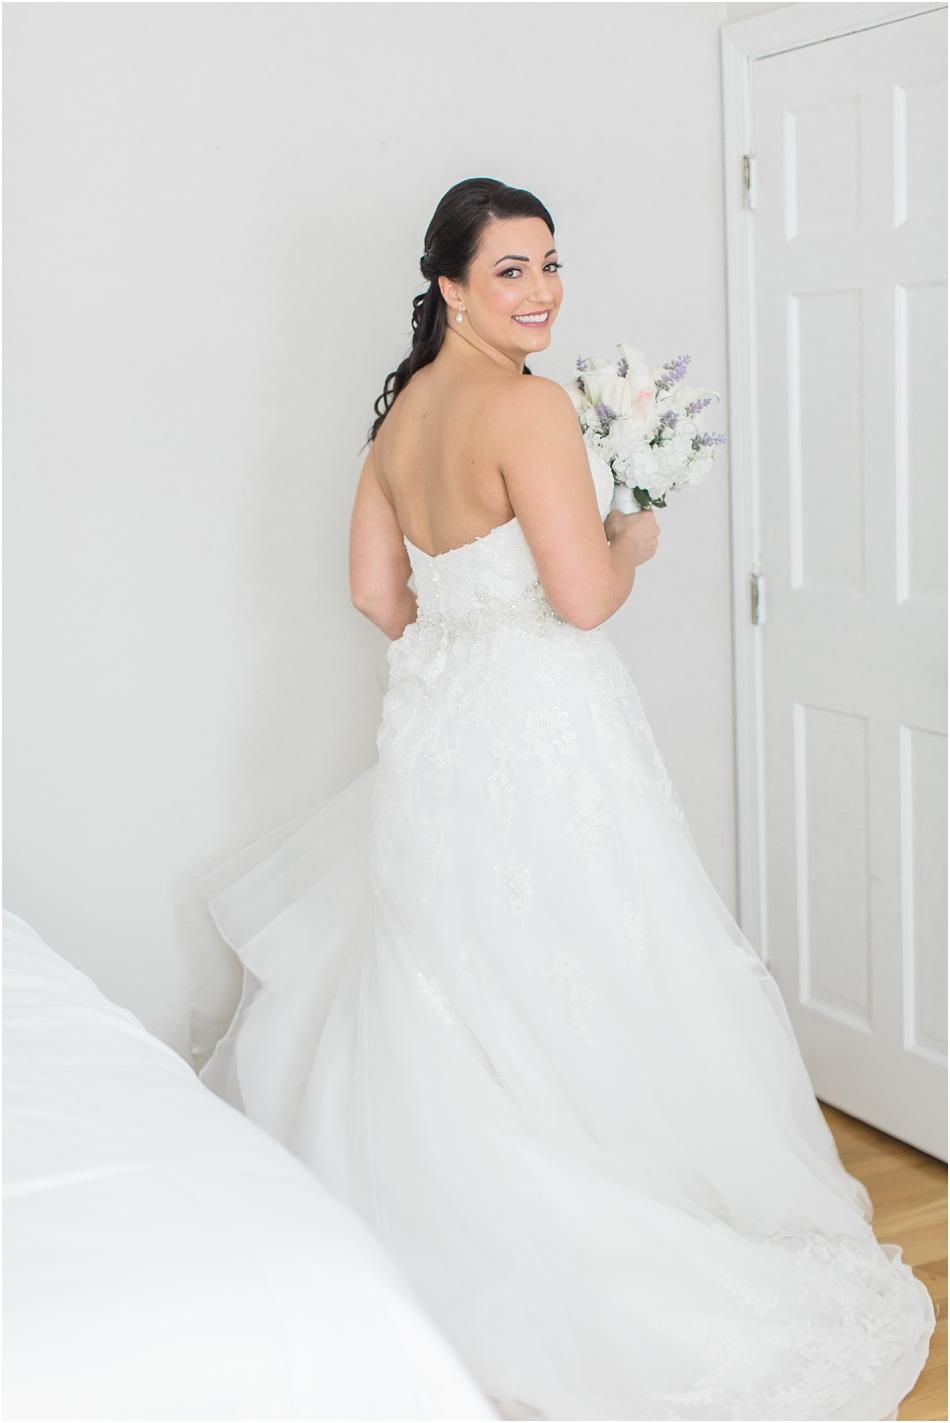 north_reading_lauren_sal_ballroom_cape_cod_boston_new_england_wedding_photographer_Meredith_Jane_Photography_photo_0106.jpg